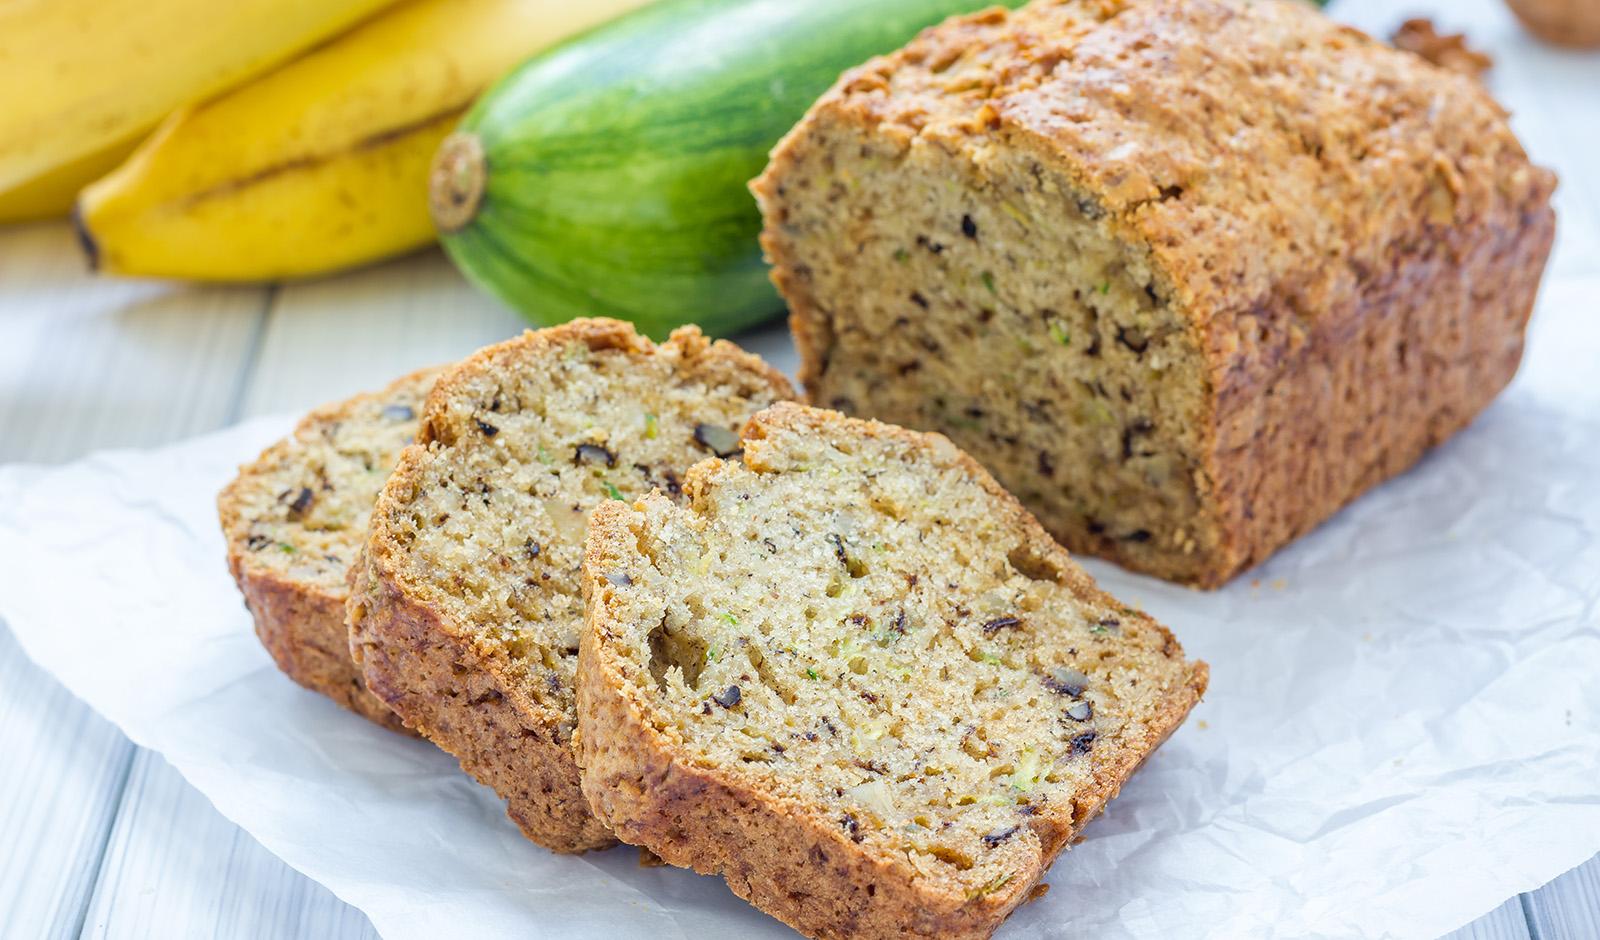 vegan-zucchini-bread-recipe-viva-glam-magazine